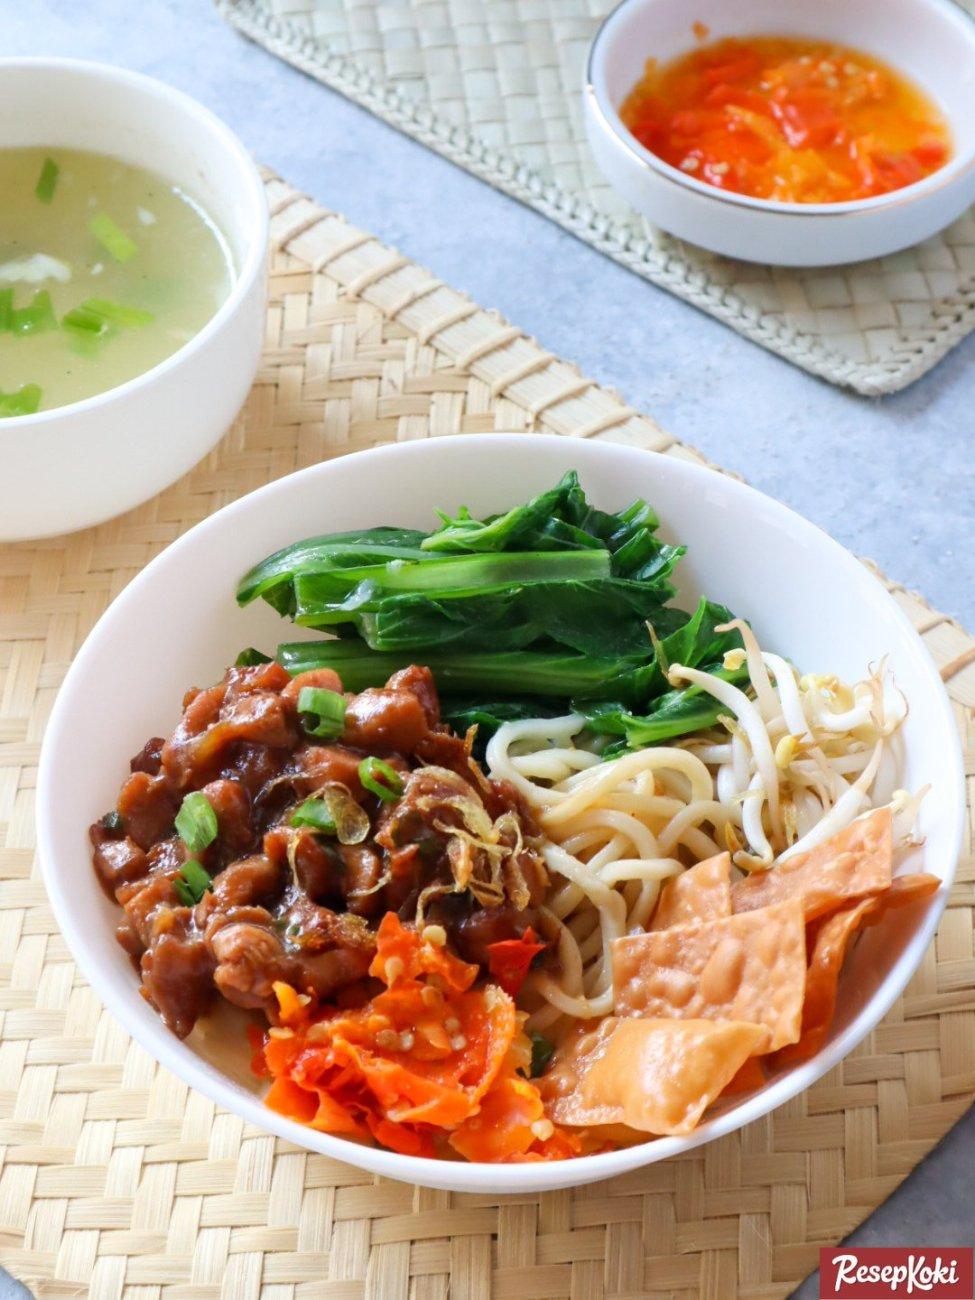 Resep Kuah Mie Ayam : resep, Bangka, Gurih, Sederhana, Resep, ResepKoki